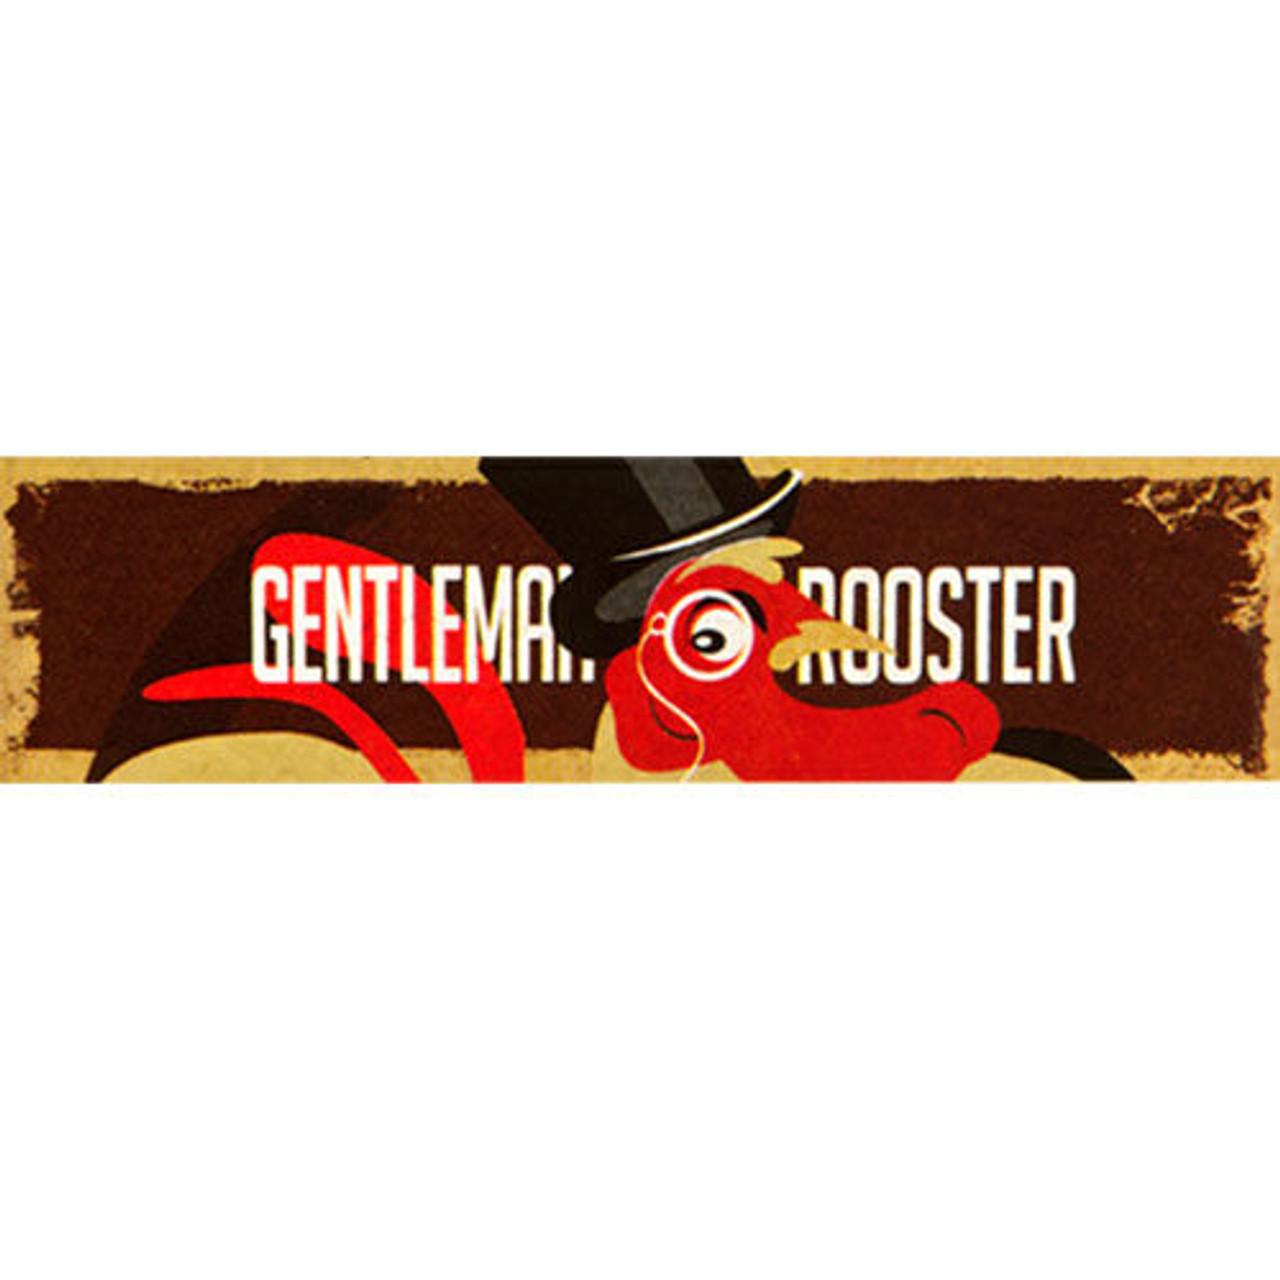 Gentleman Rooster Robusto Cigars - 5 x 50 (Bundle of 20)